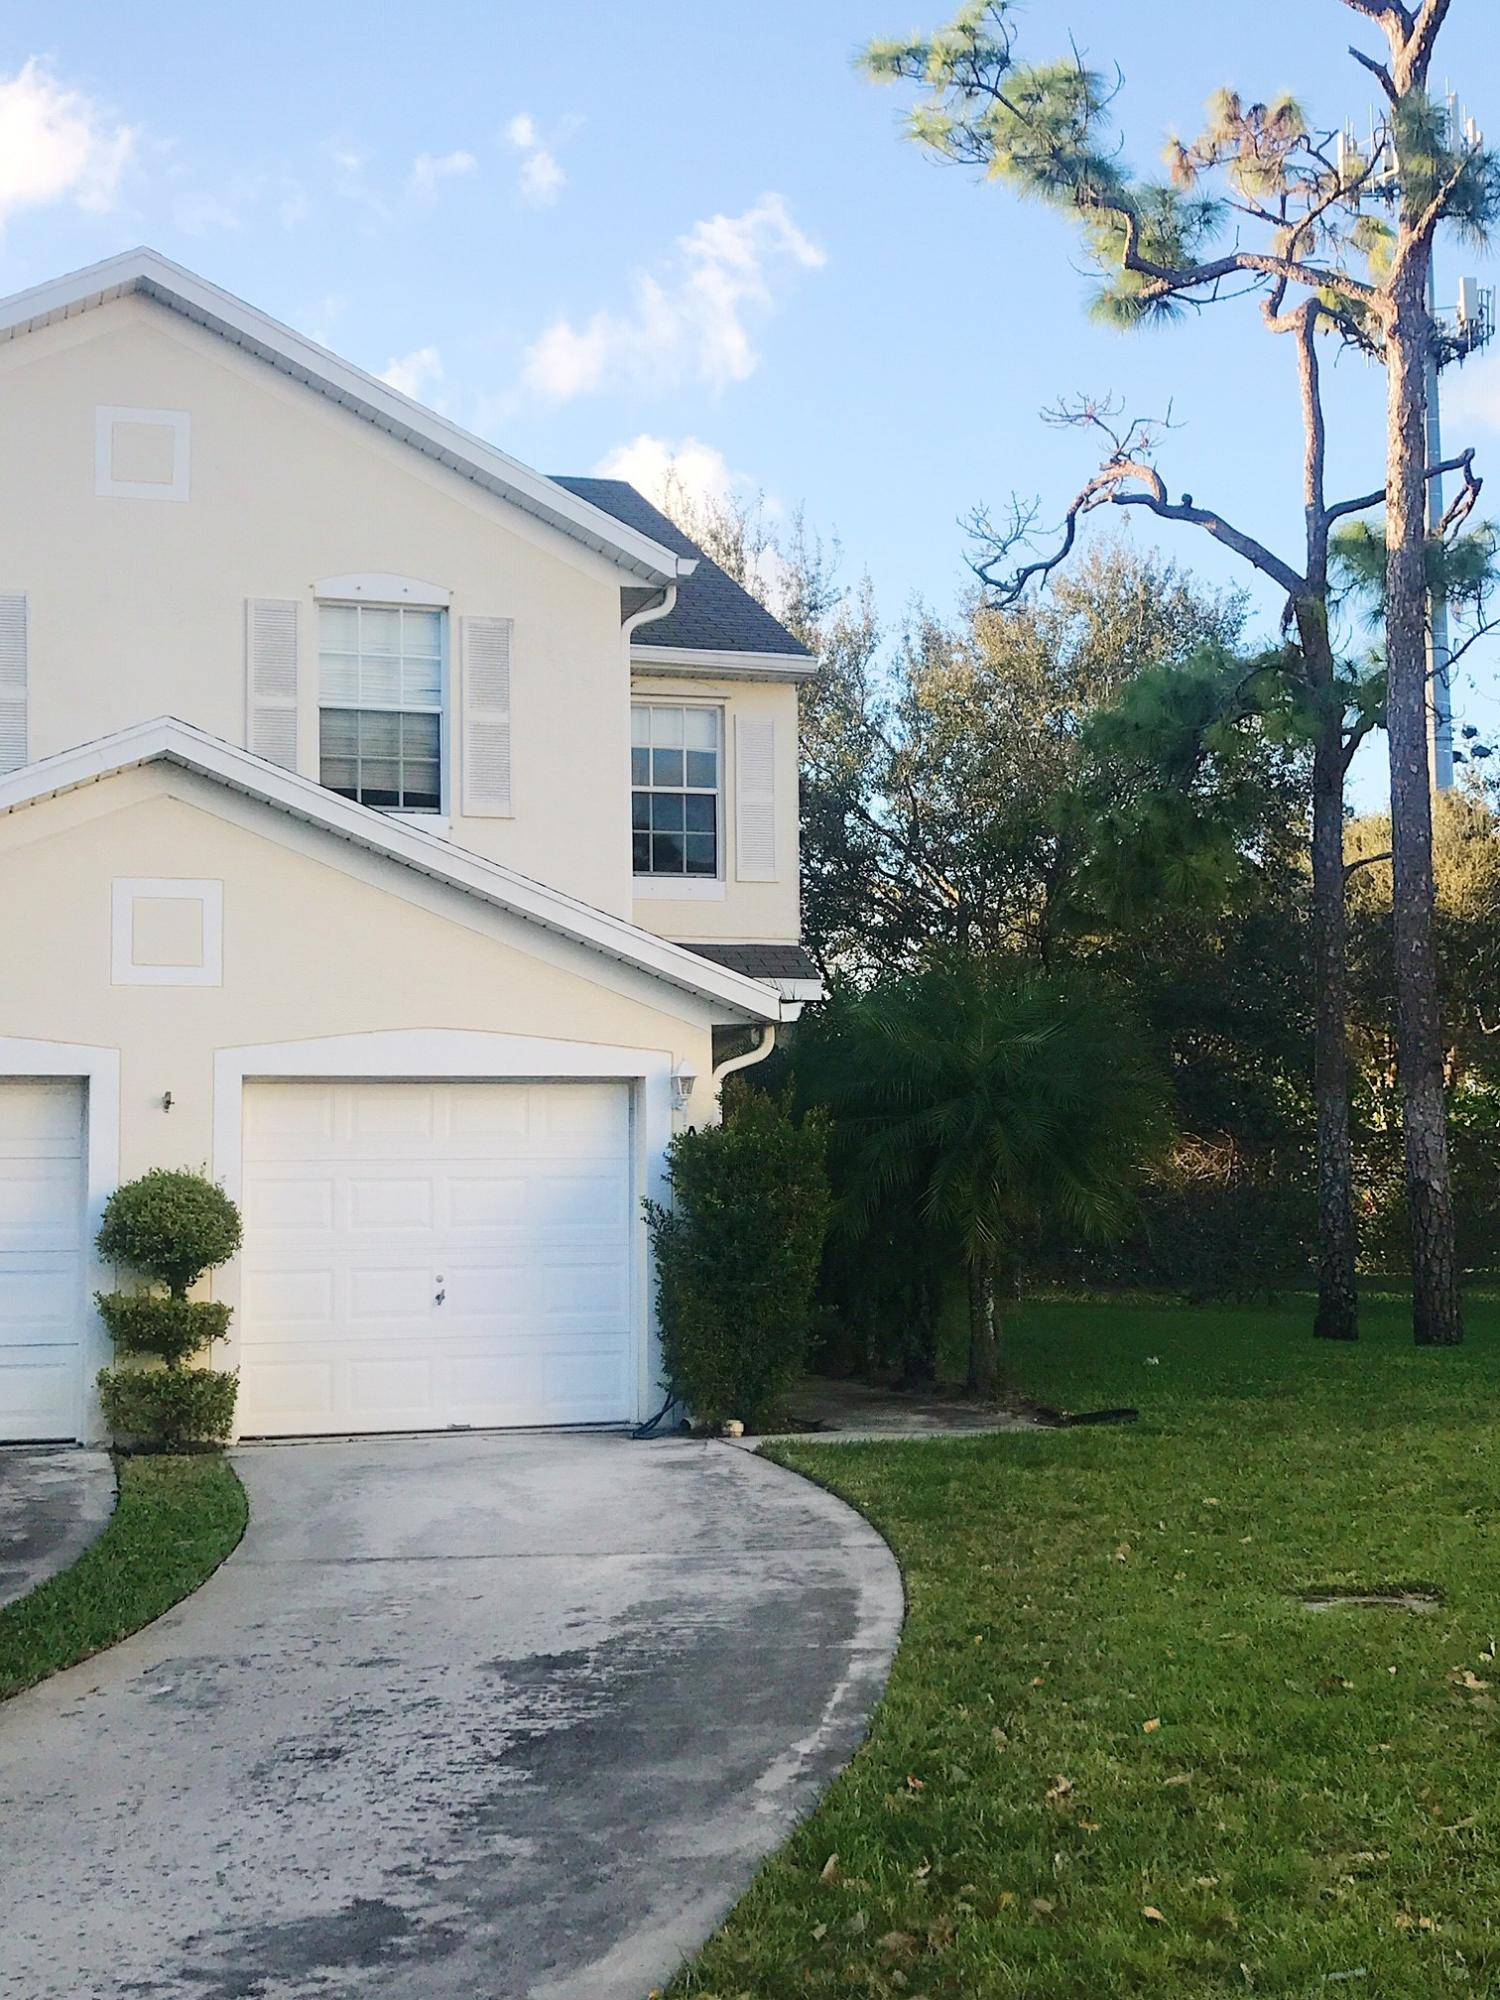 225 Foxtail Drive, Greenacres, FL 33415